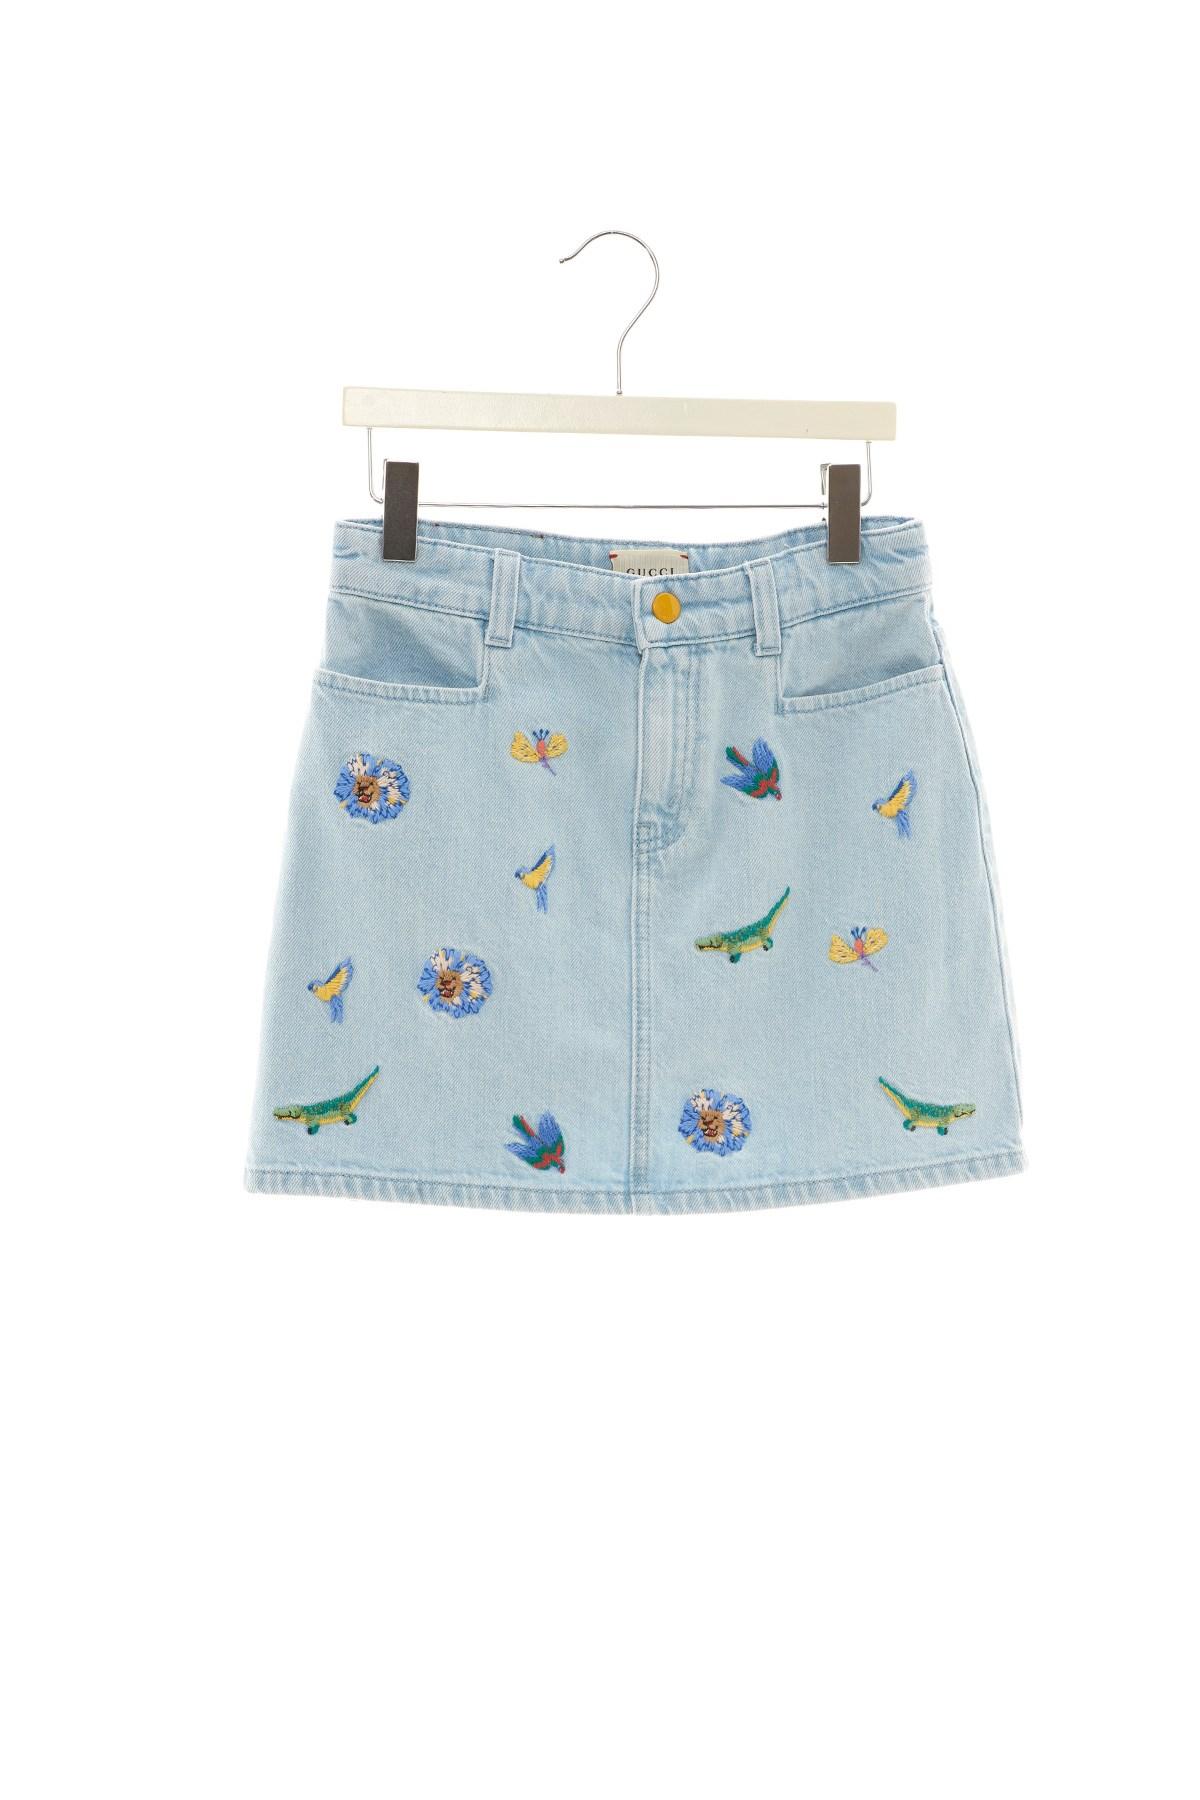 3c23bb46 Gucci Embroidered Denim Skirt - raveitsafe